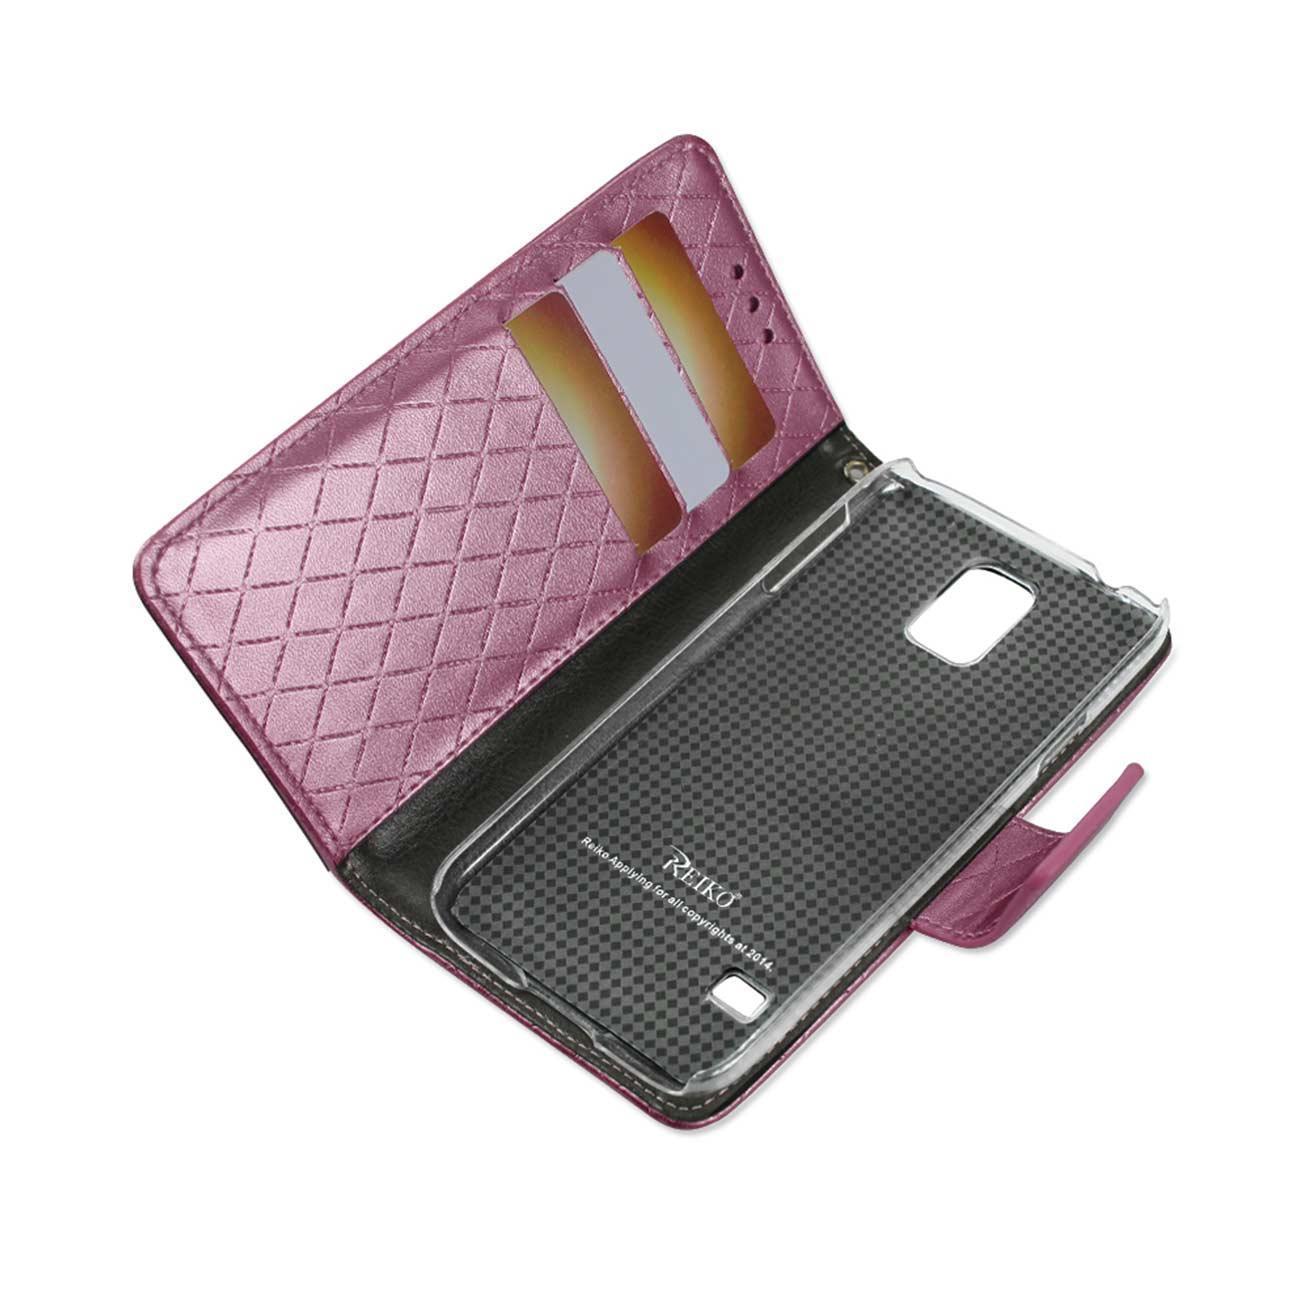 Reiko Samsung Galaxy S5 Rhombus Wallet Case In Hot Pink